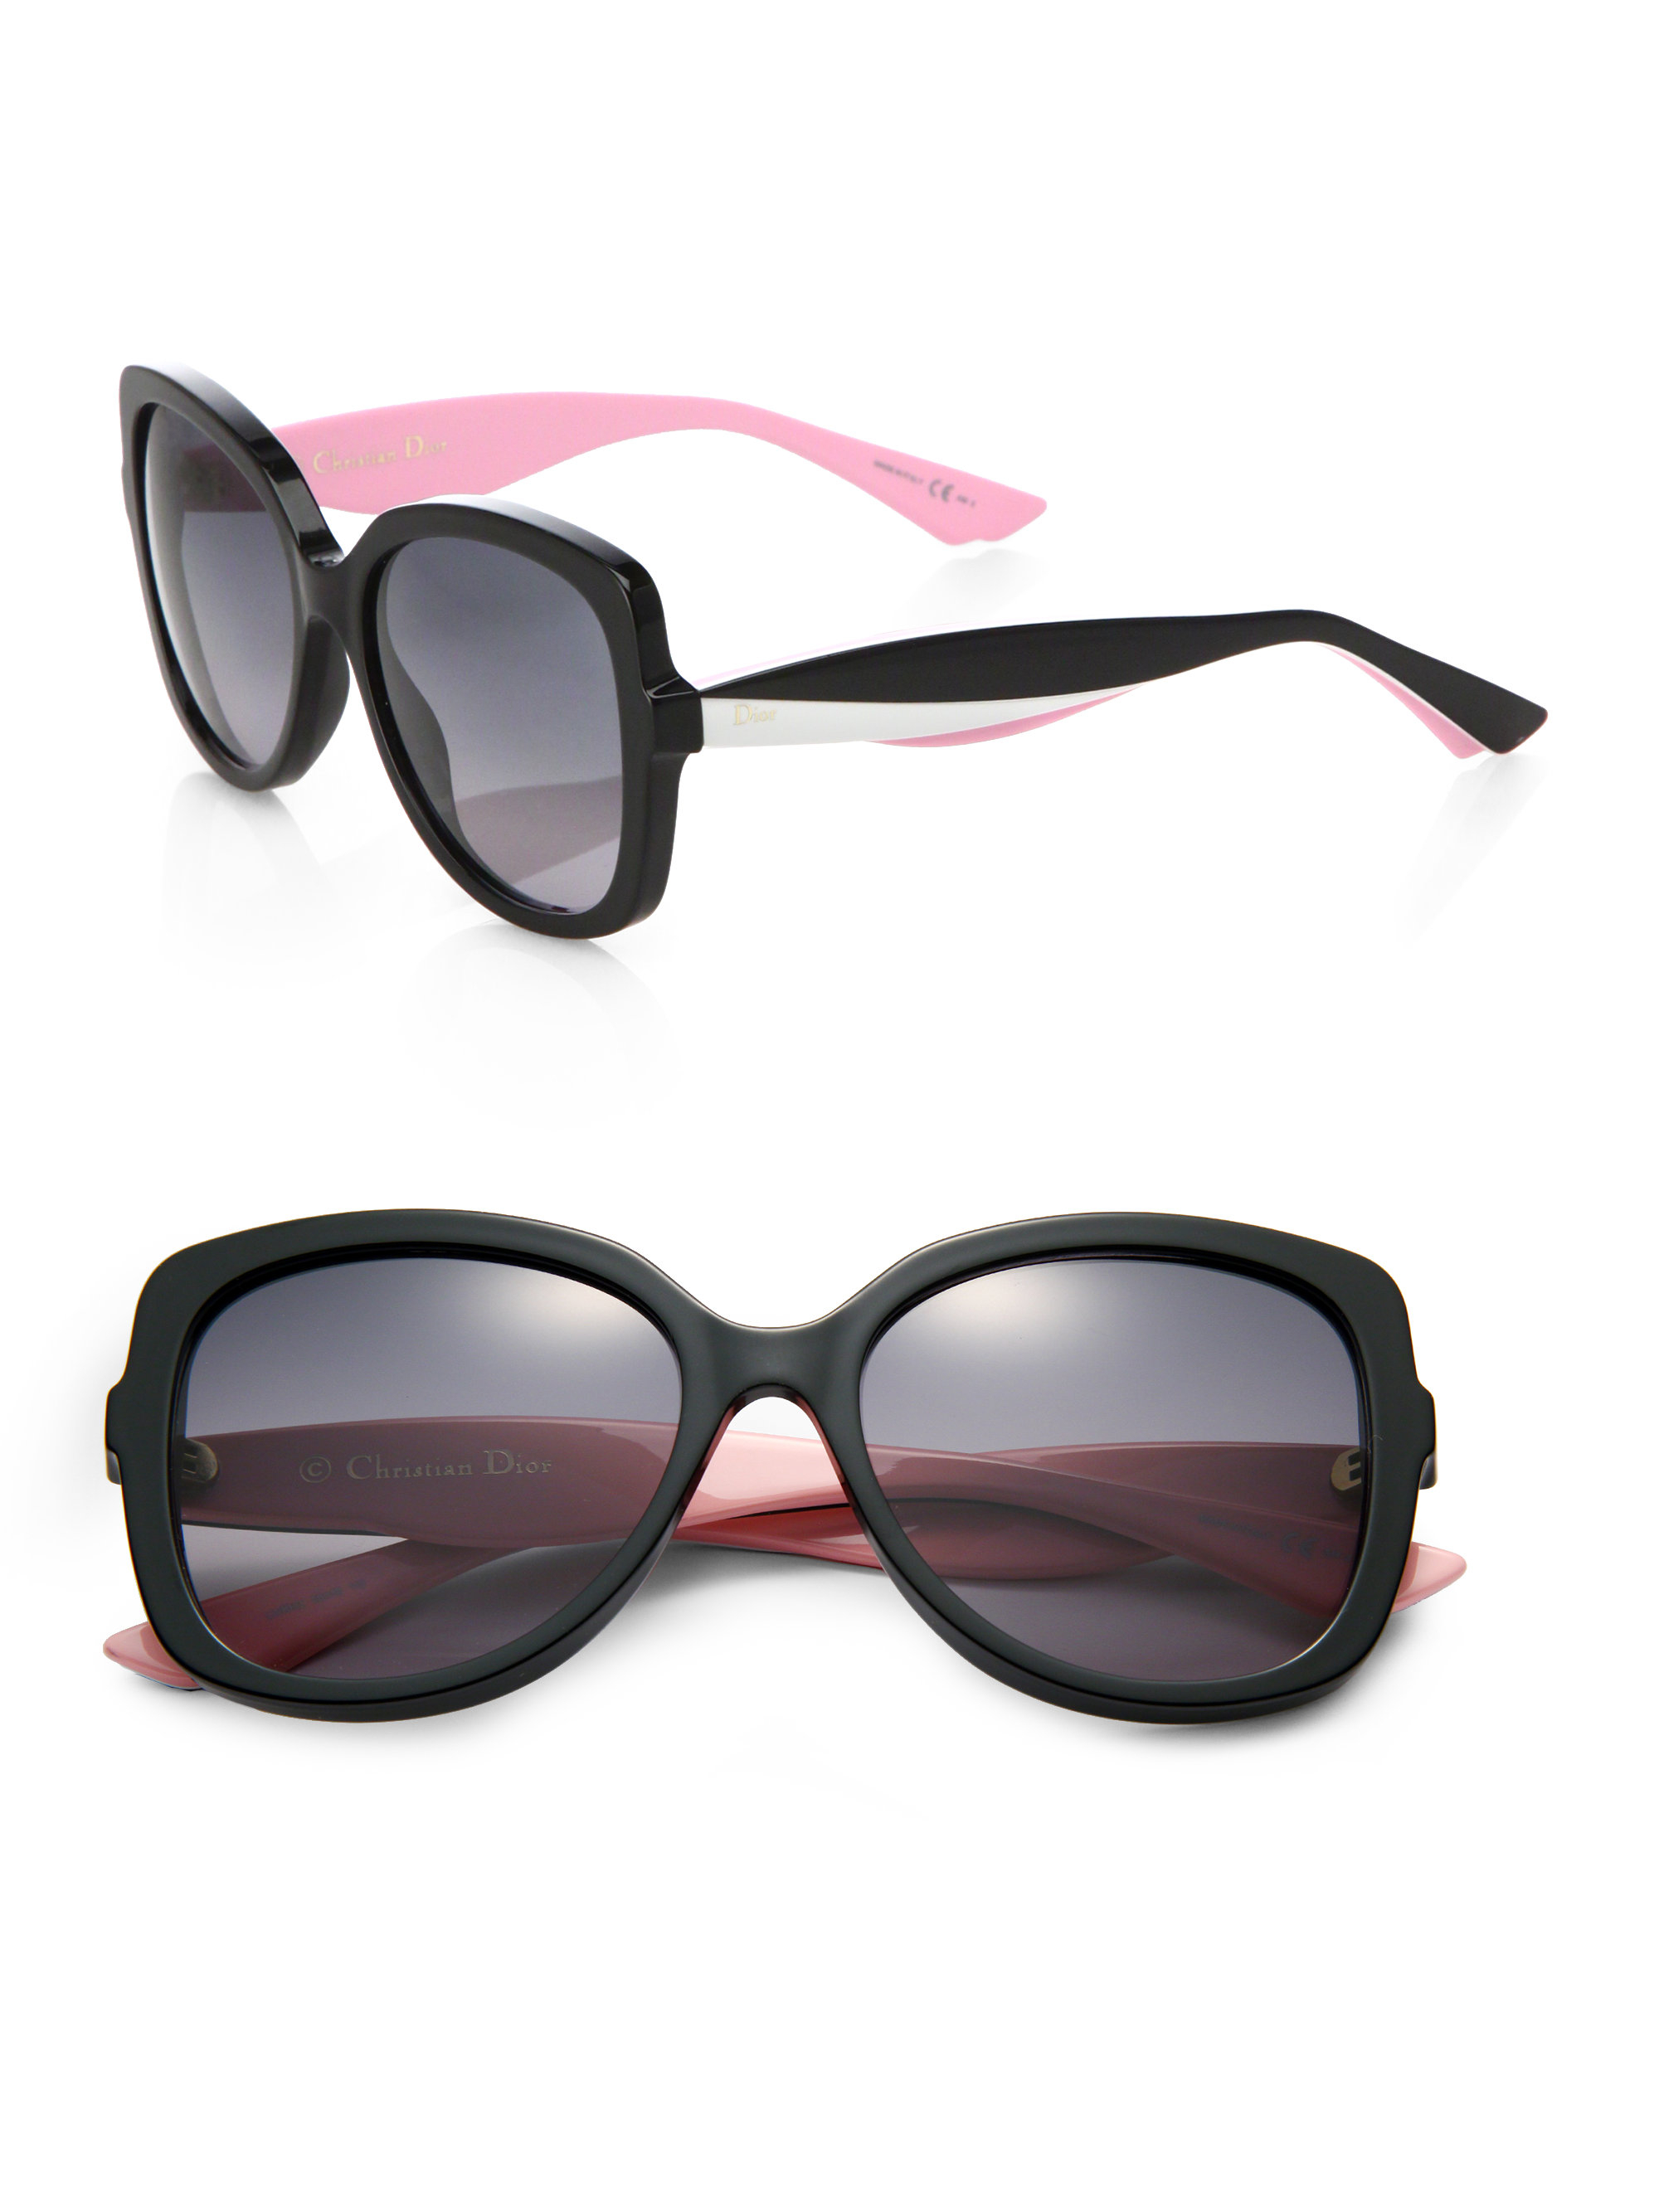 Dior Black Frame Glasses : Dior Envol Round-frame Sunglasses in Black Lyst